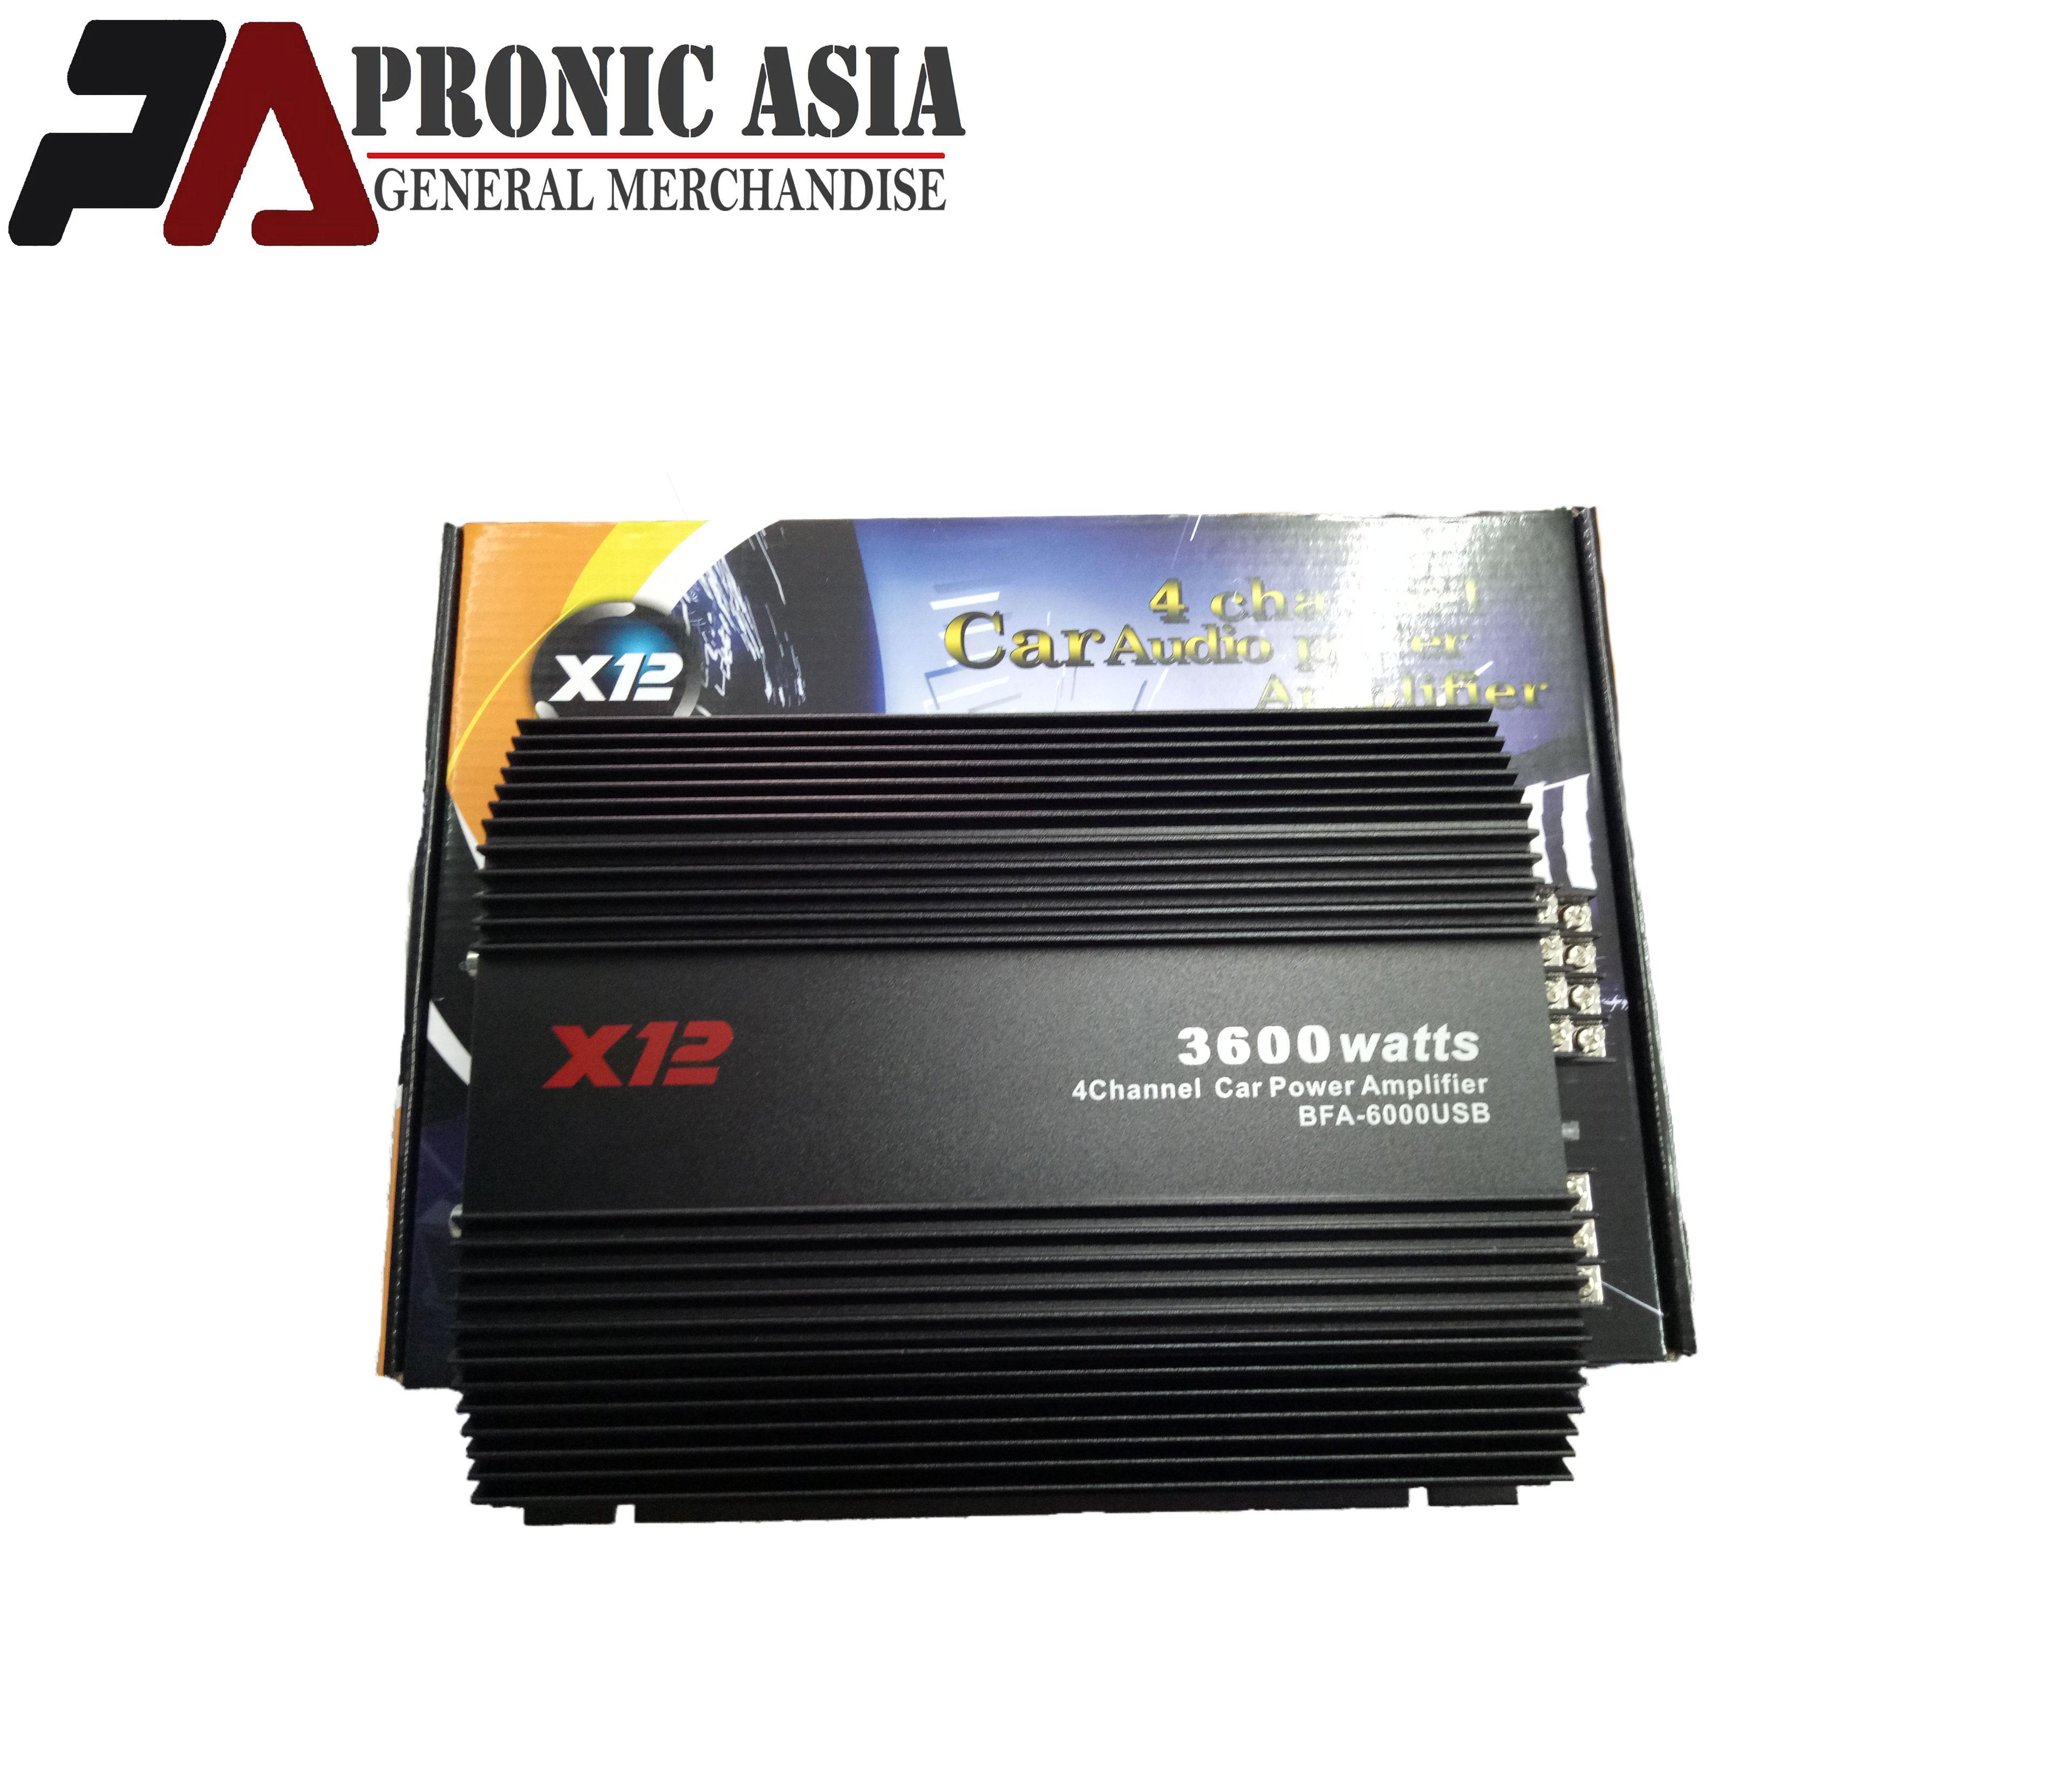 X12 BFA-6000BT 3600 watts 4 channel Power Amplifier w/ USB, Bluetooth